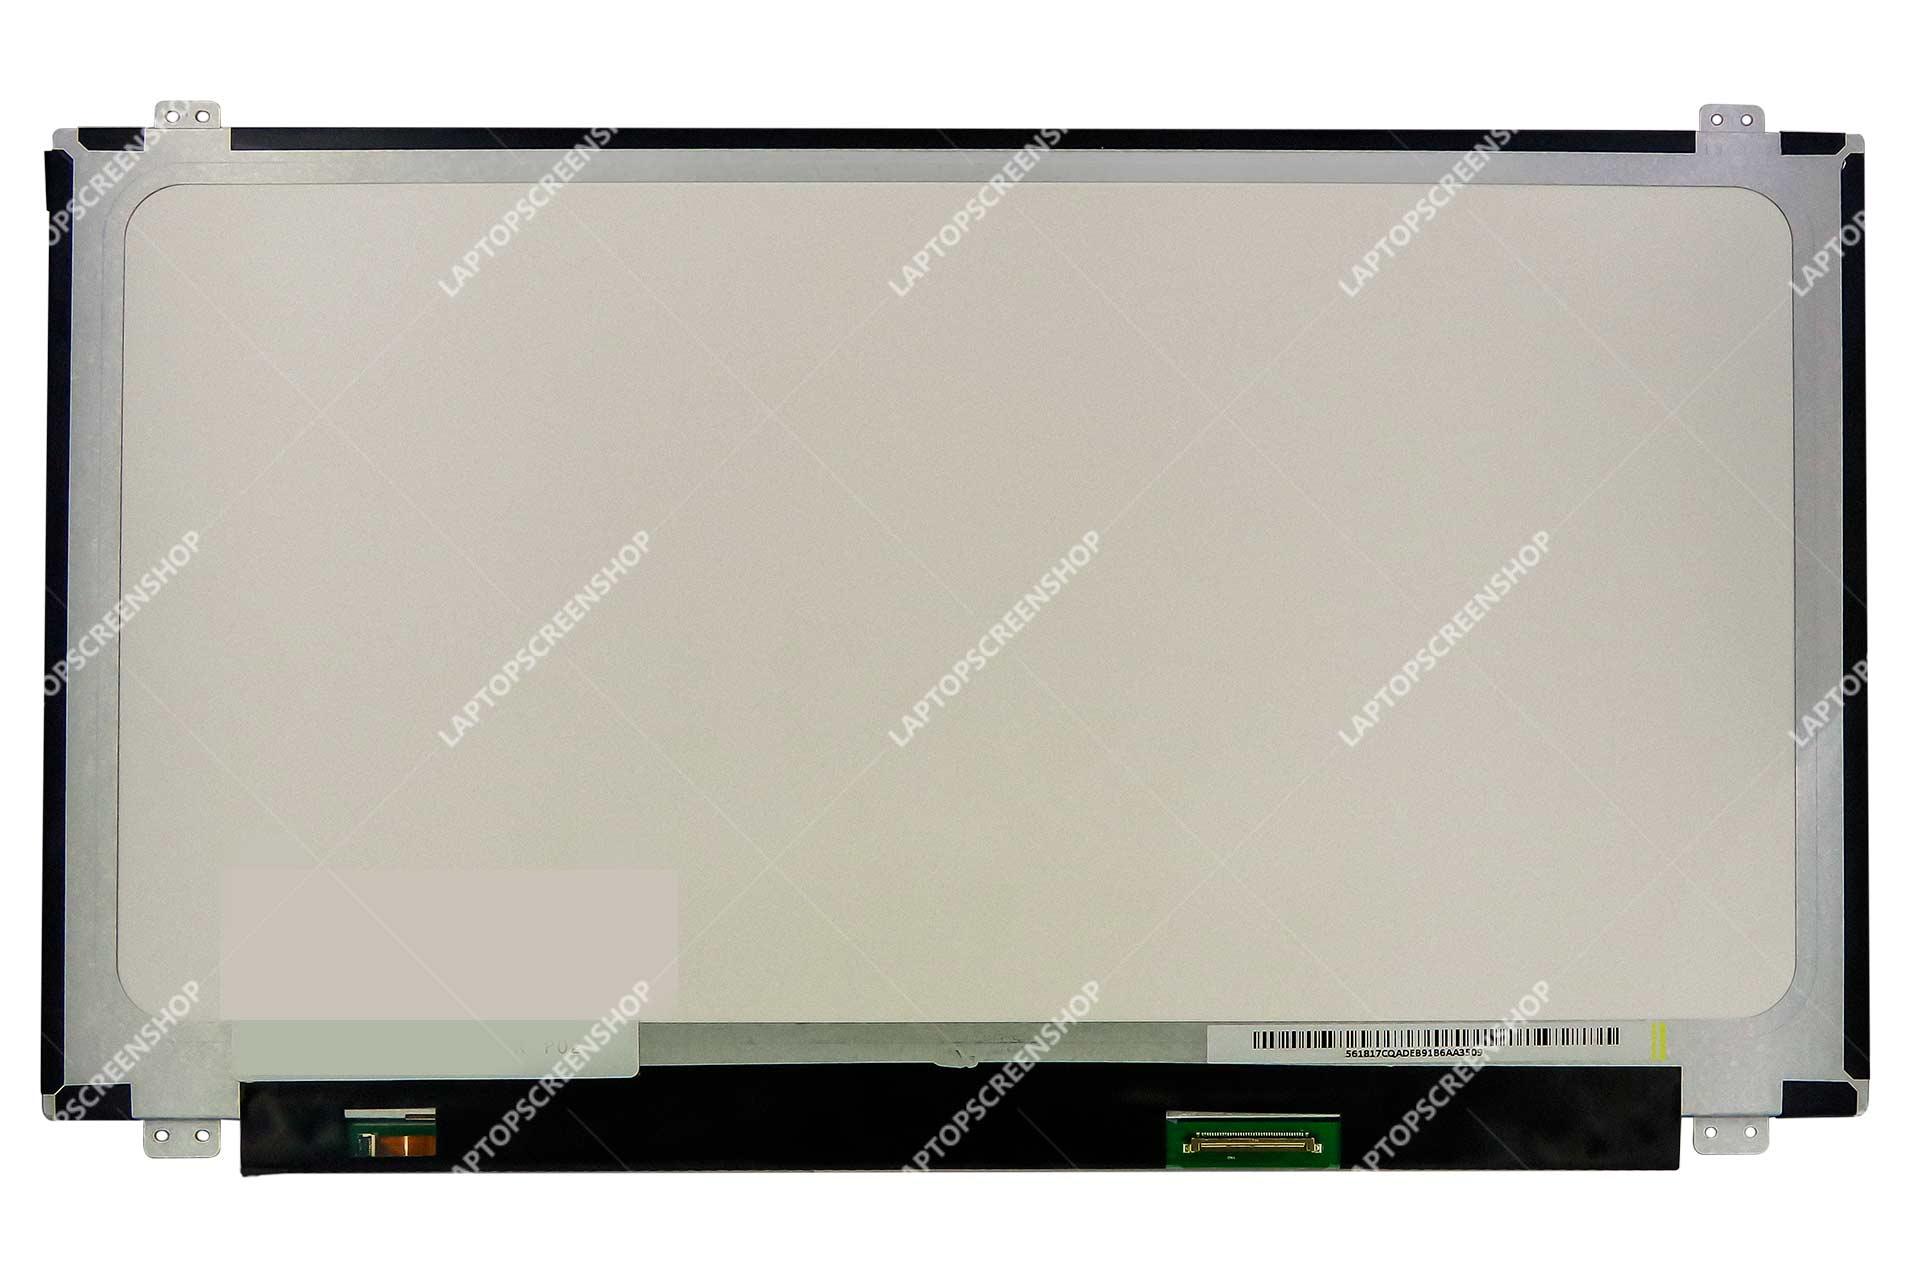 SONY-VAIO-SVS15116G-LCD |FHD|فروشگاه لپ تاپ اسکرين | تعمير لپ تاپ